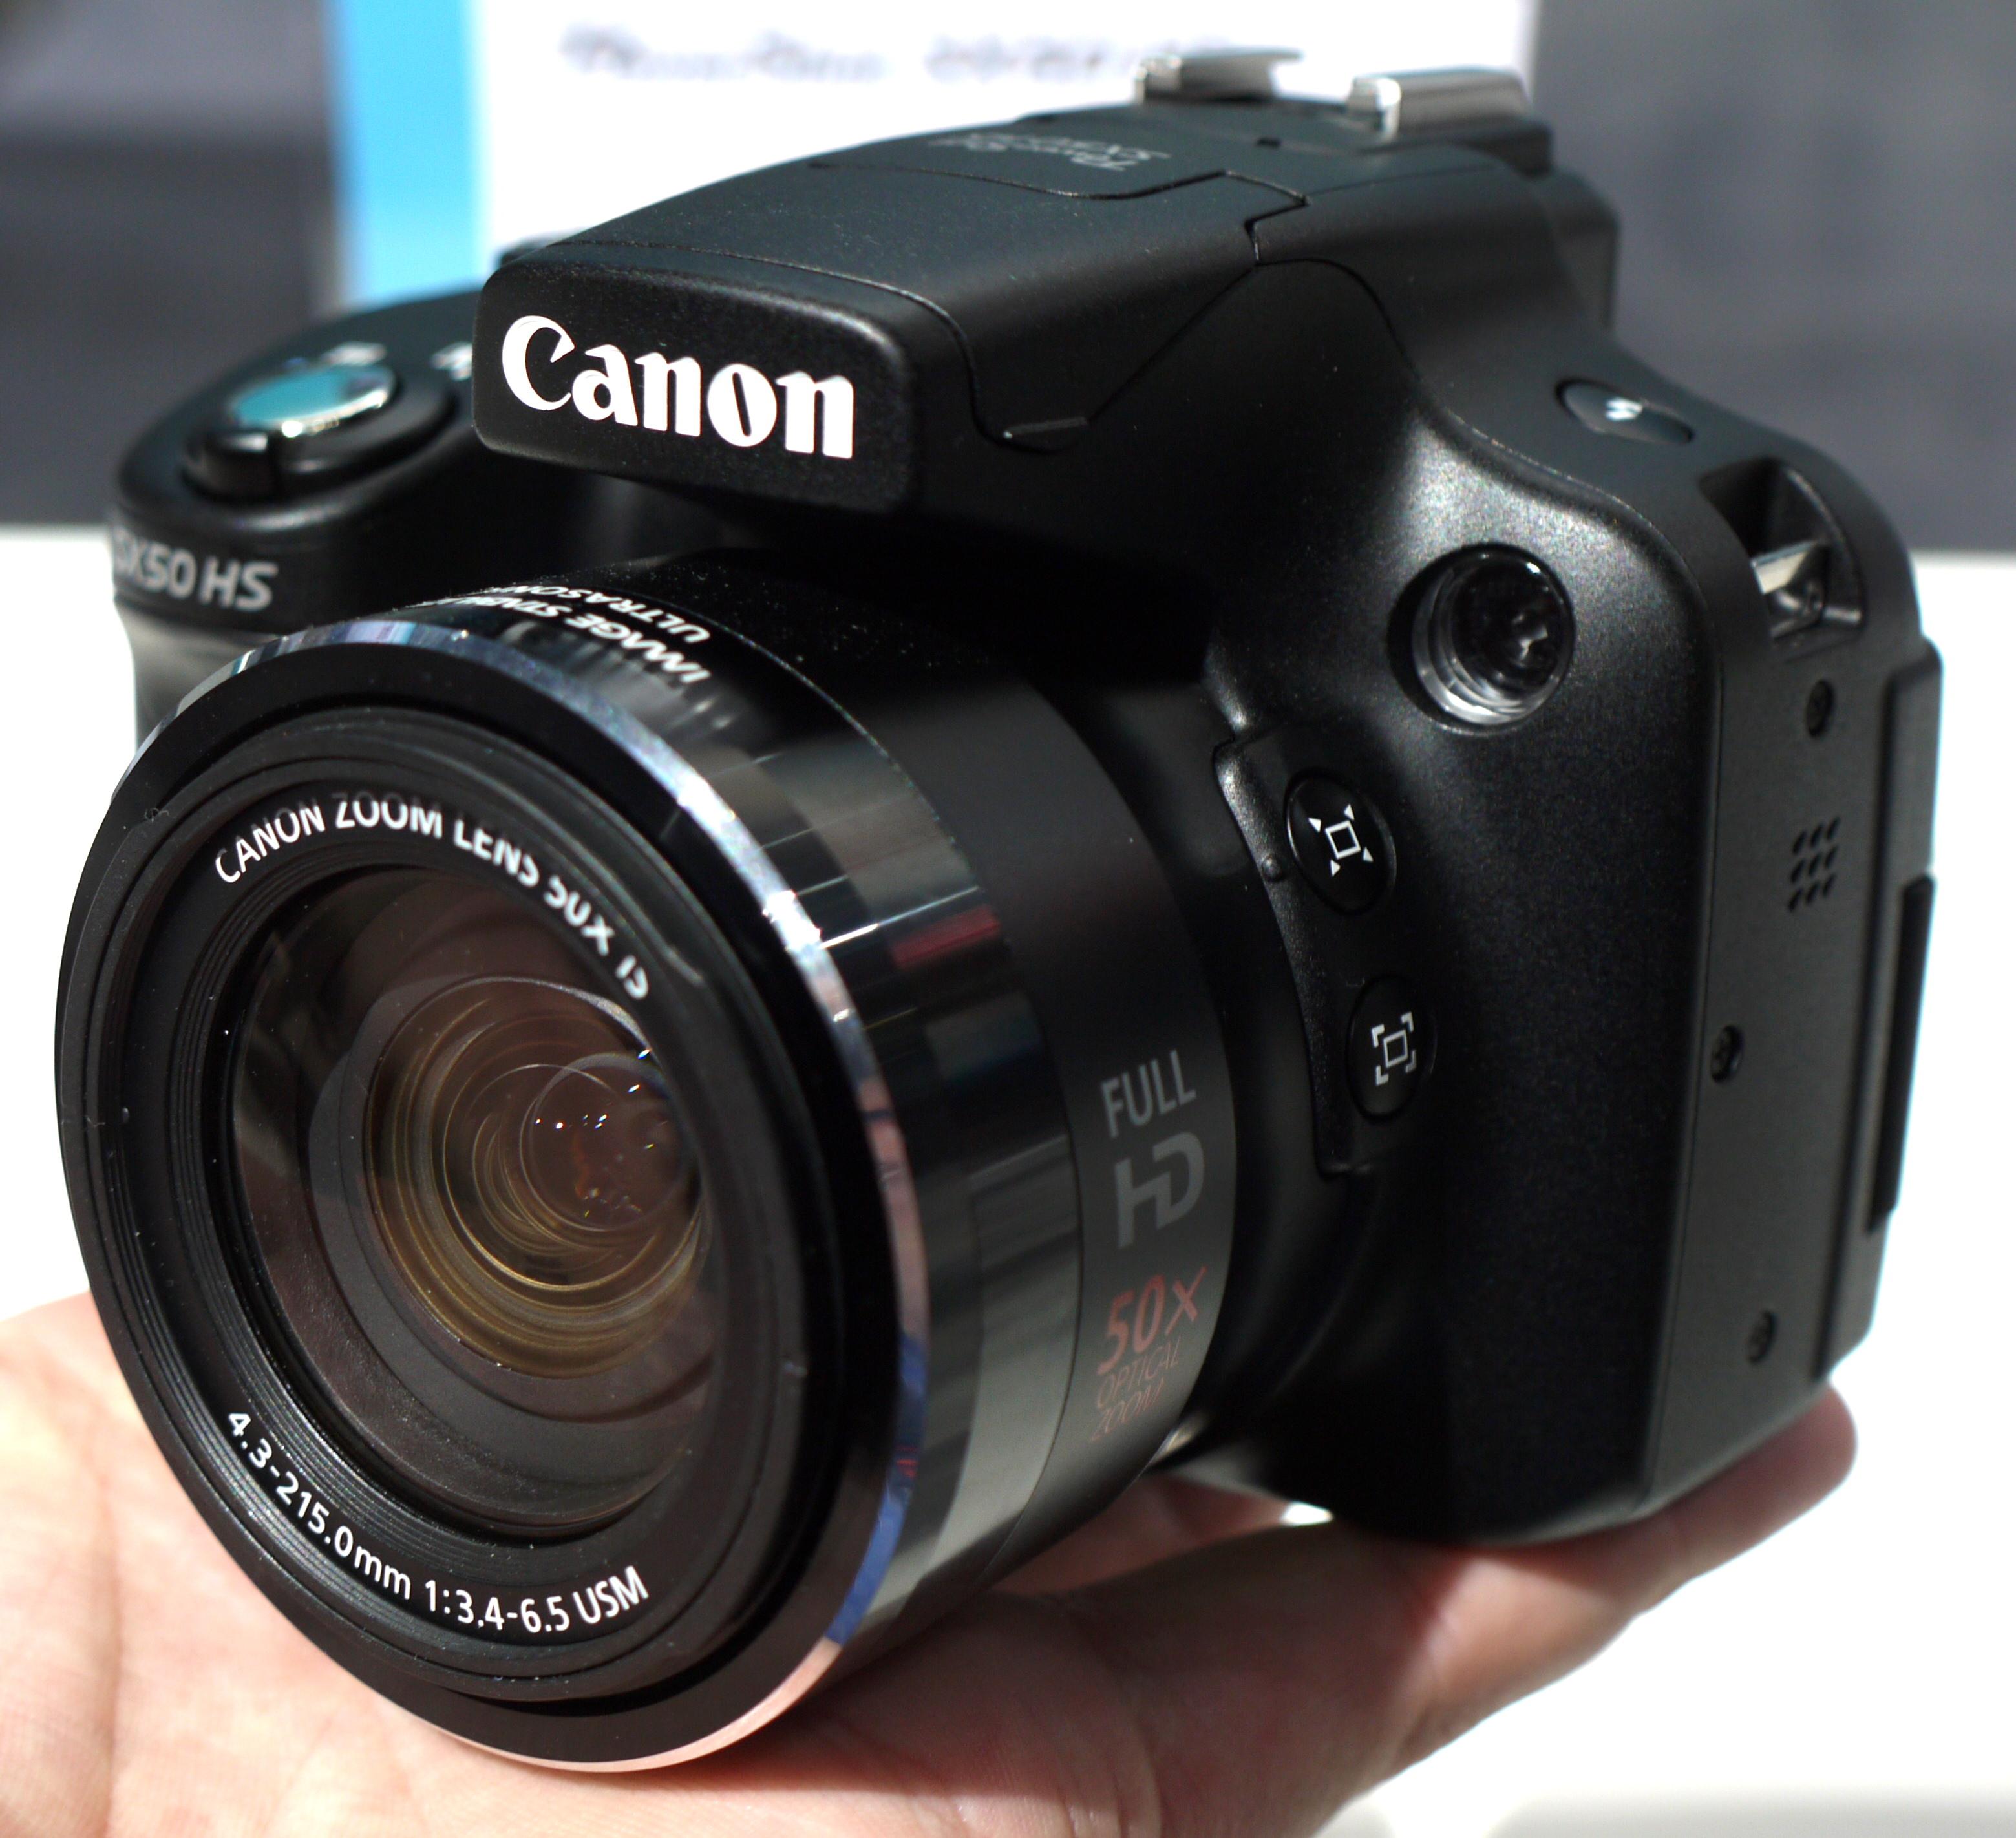 Canon Powershot SX50 Hands-On At Photokina 2012